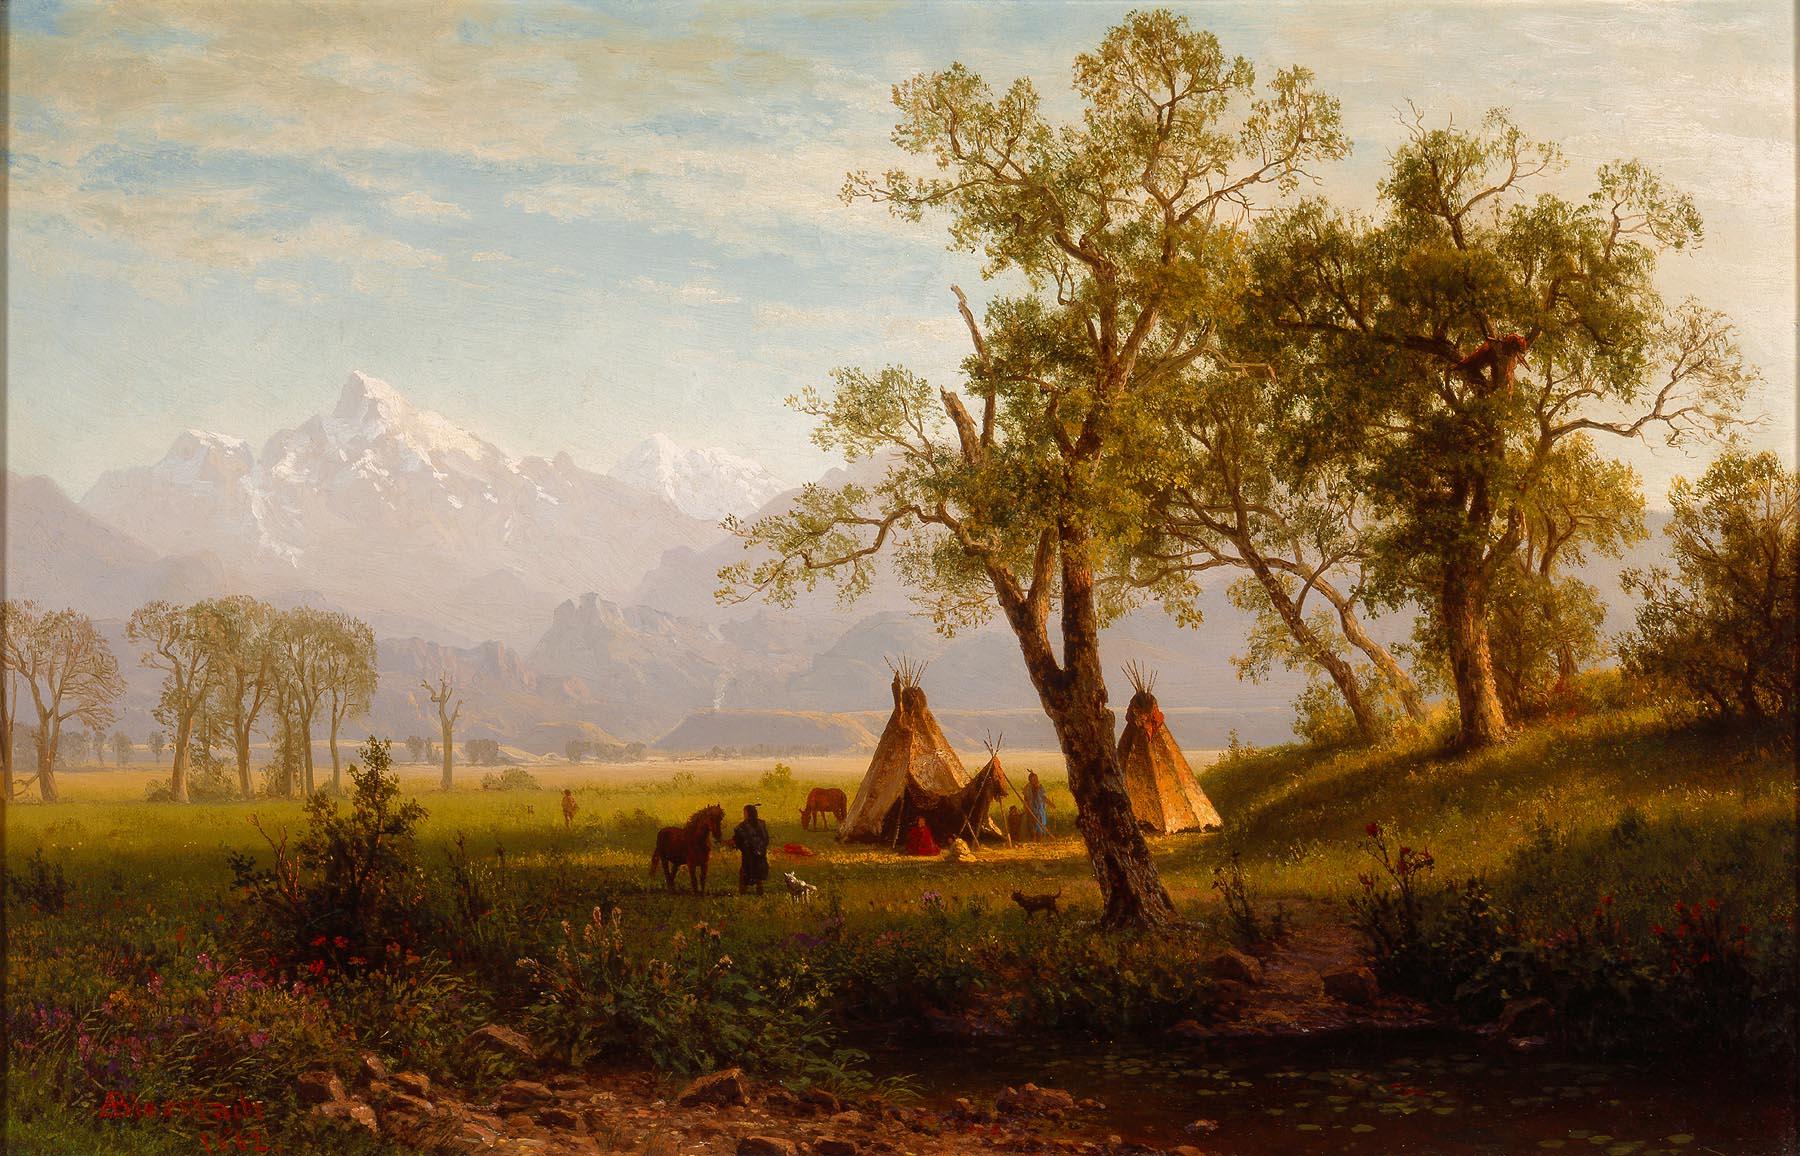 Albert Bierstadt (American, b. Germany, 1830–1902), Wind River Mountains, Nebraska Territory, 1862. Oil on board. Milwaukee Art Museum, Layton Art Collection, Inc., Purchase L1897.3. Photo credit: Larry Sanders.